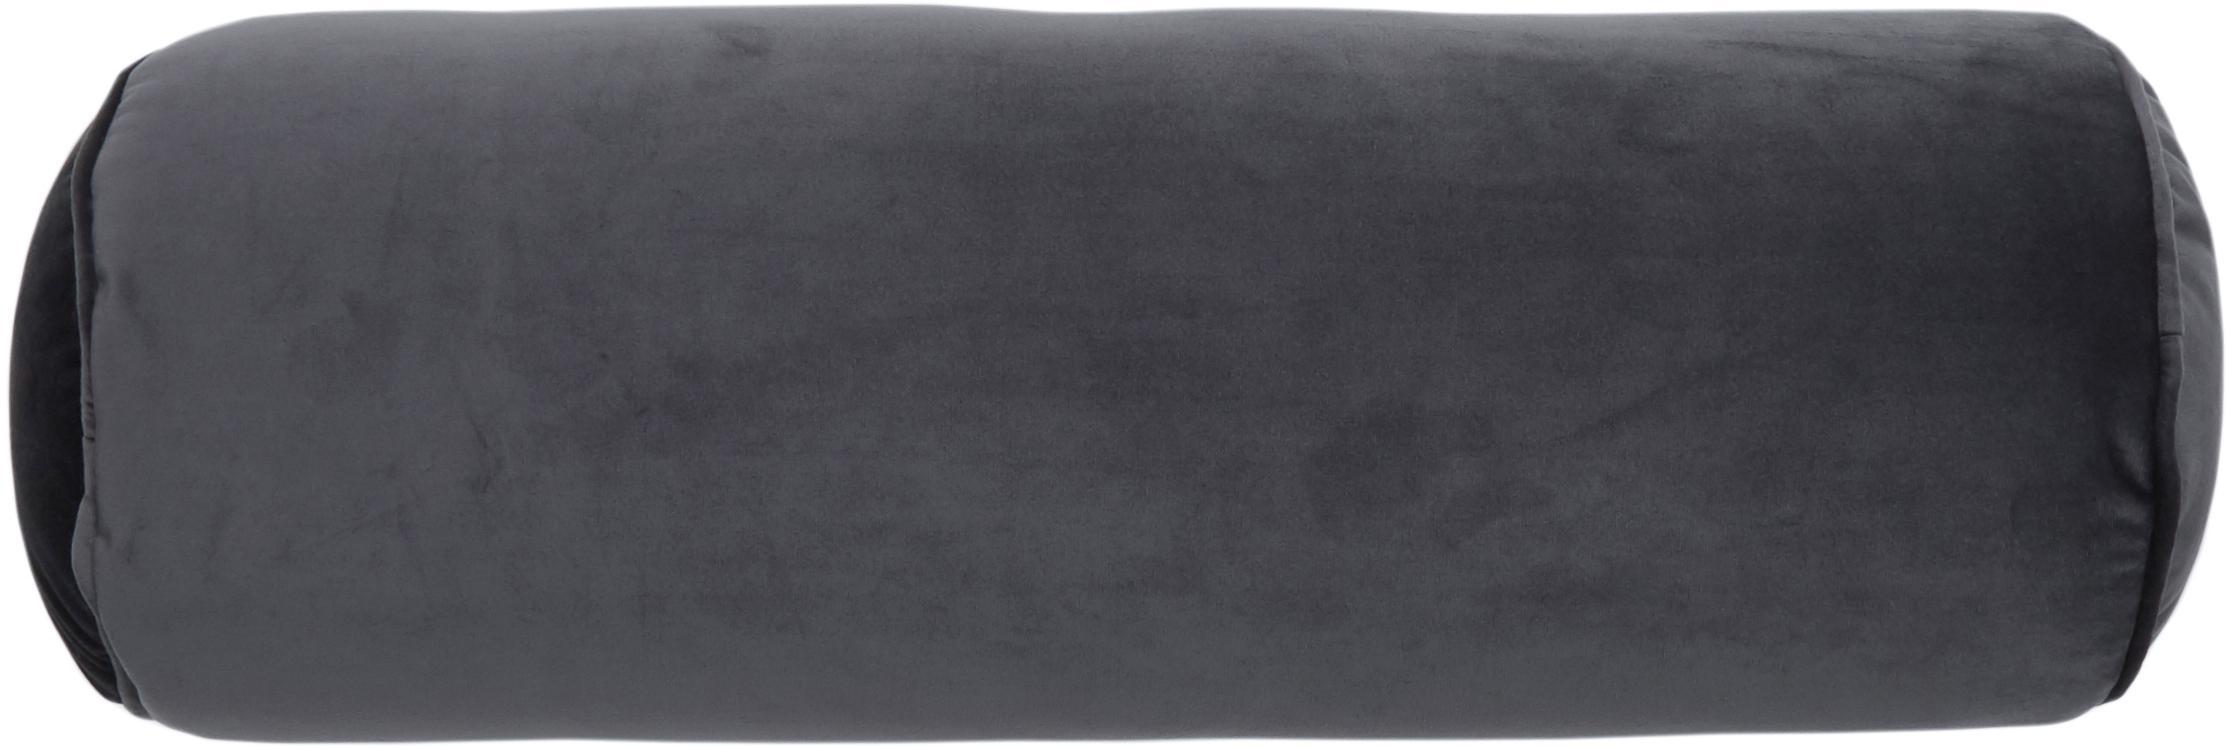 Glanzende fluwelen nekrol Monet, Donkergrijs, Ø 18 x L 50 cm